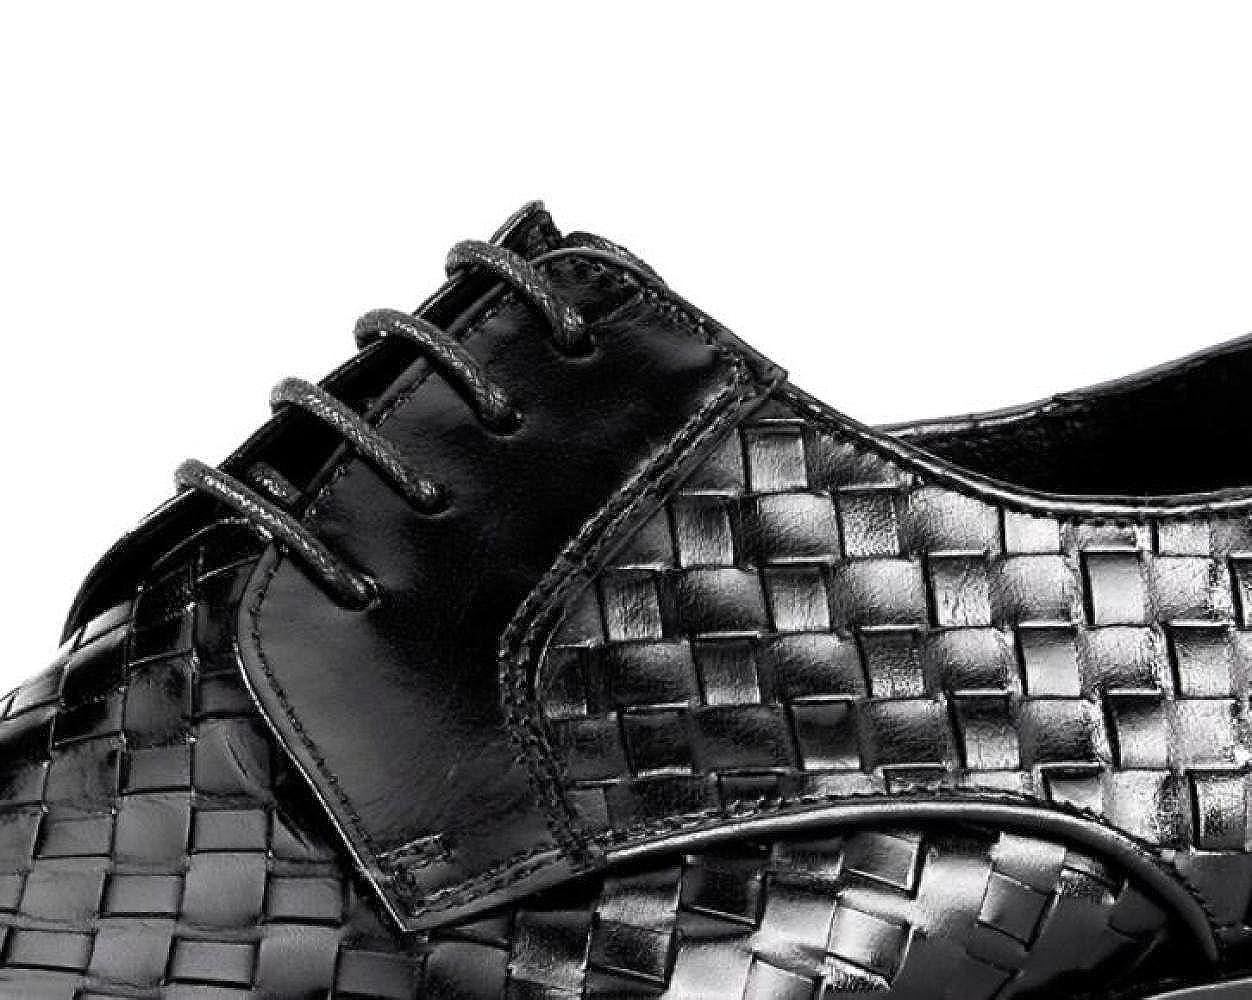 DHFUD British Geflochtene Schuhe British DHFUD Herren Geschäft-Anzüge Atmungsaktive Leder Herrenschuhe a7d8e4